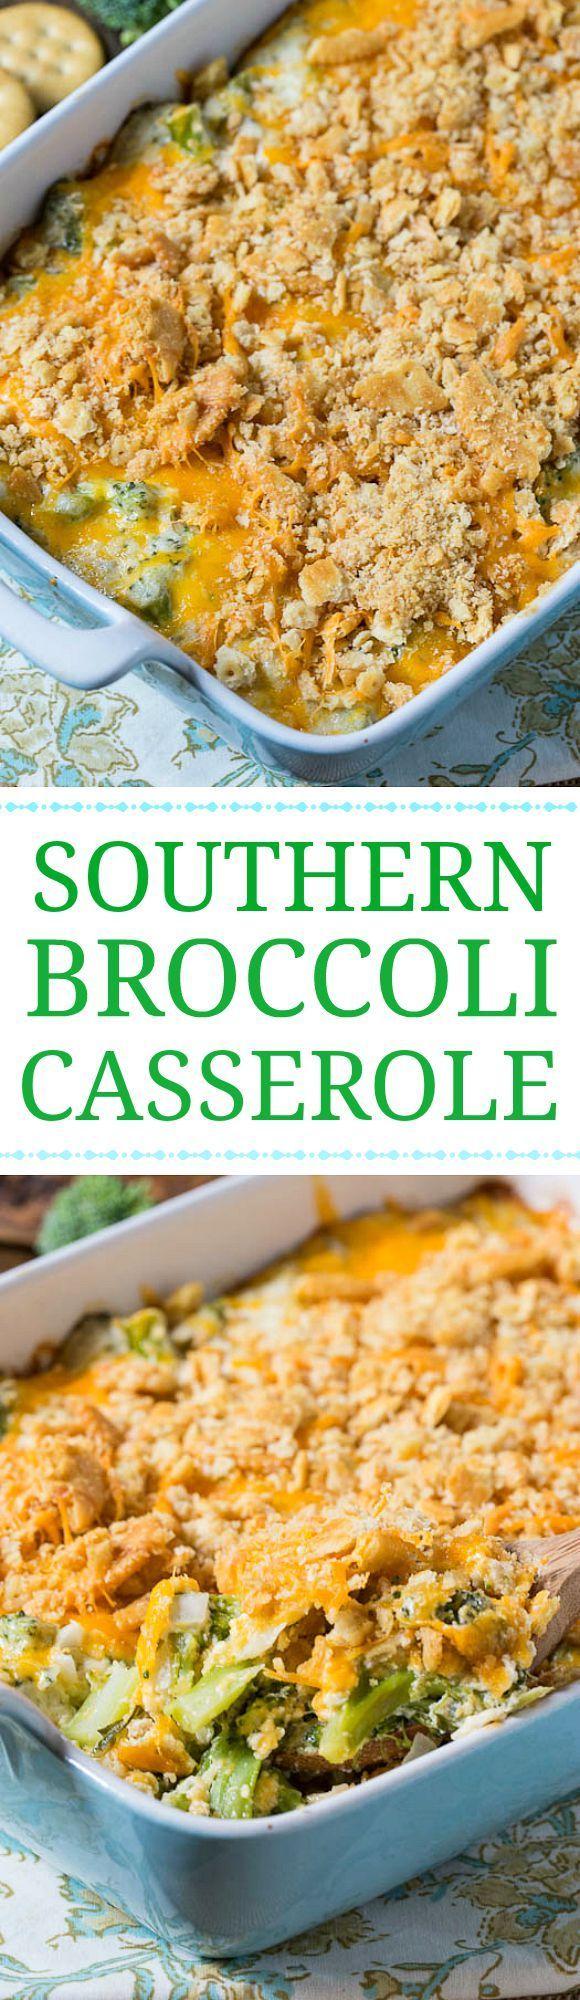 Broccoli casserole recipe broccoli casserole crackers and broccoli southern broccoli casserole with a ritz cracker topping casserole disheseasy forumfinder Image collections